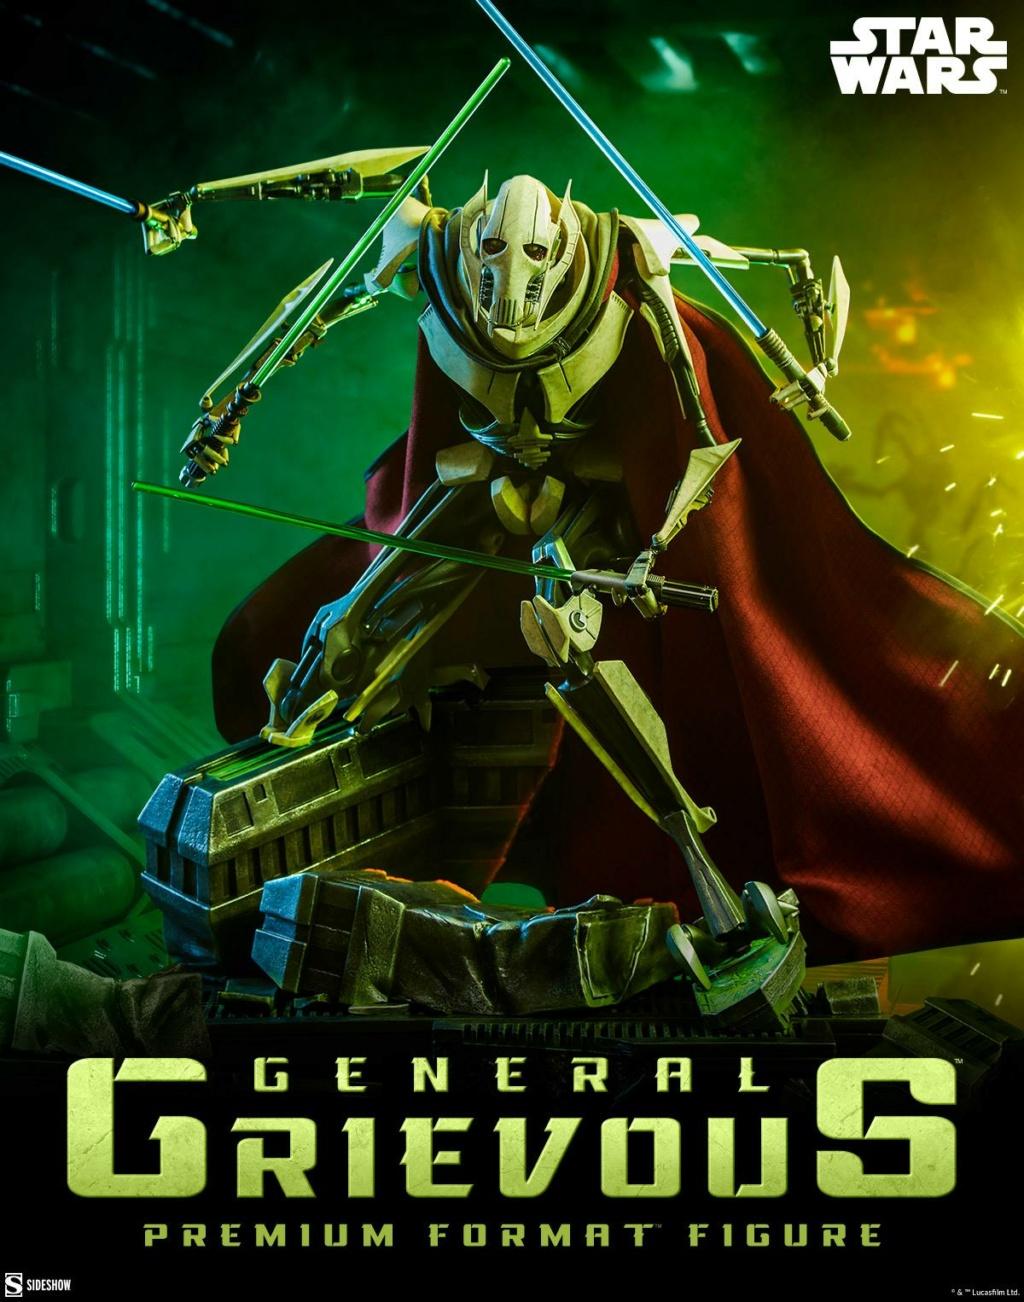 General Grievous Premium Format Figure (2021) - Sideshow Genera30